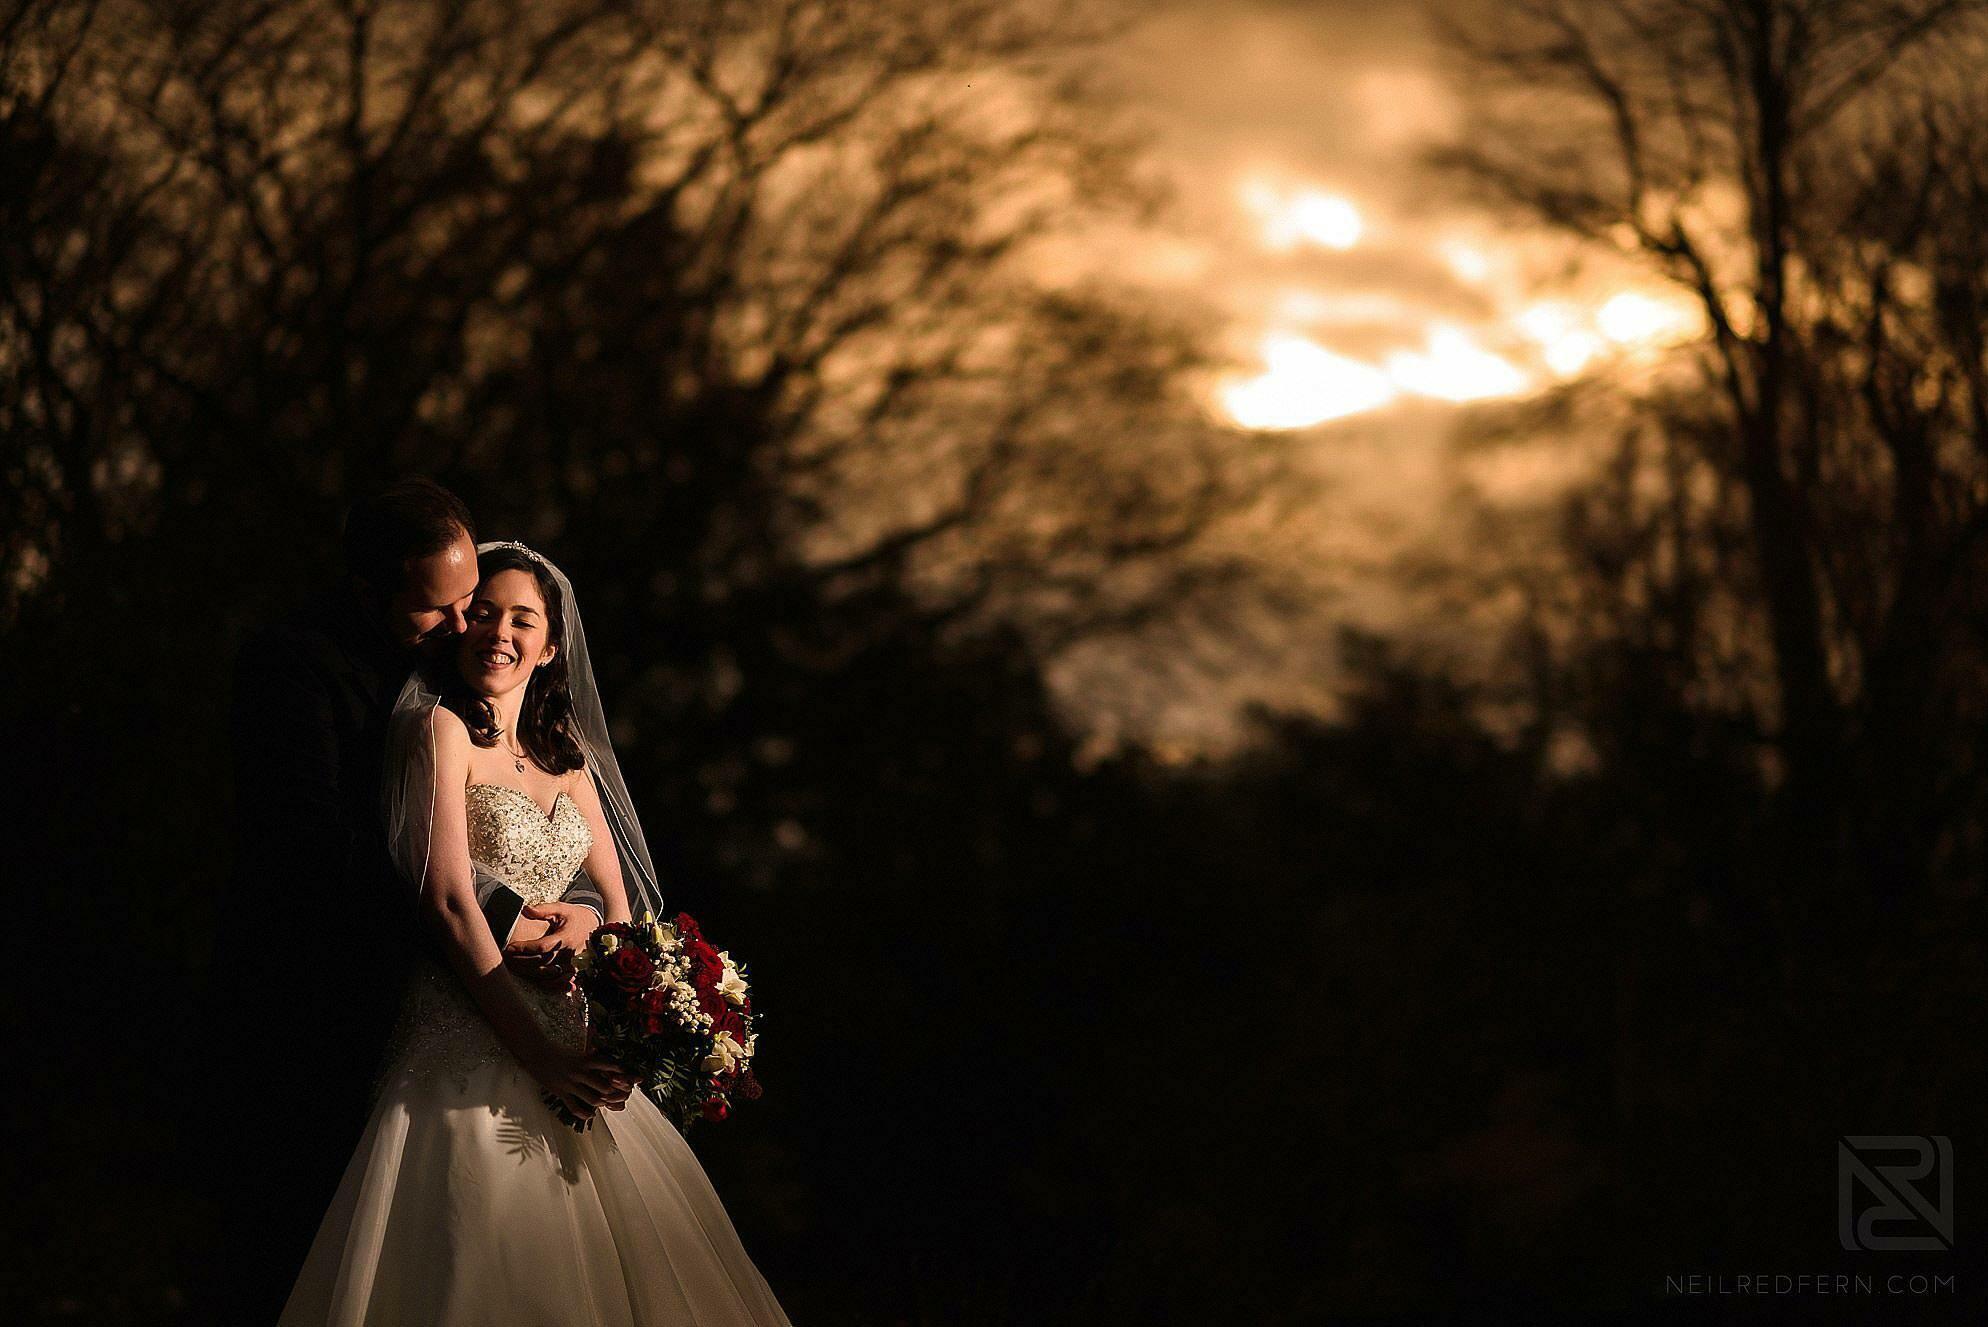 best-wedding-photography-2016-053